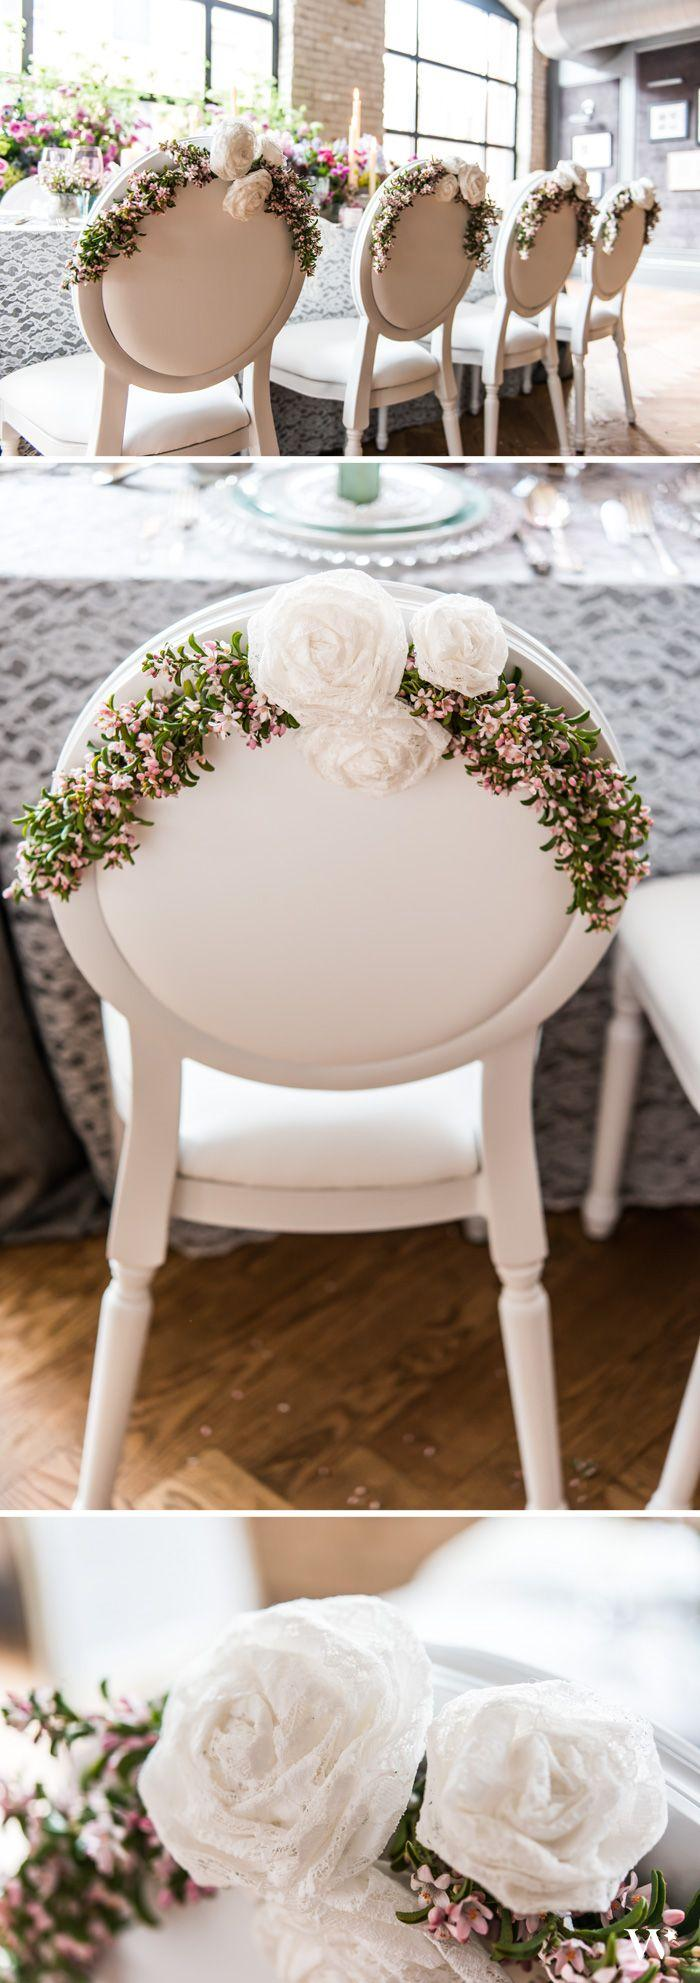 Hochzeit - Decorative Rolled Fabric Lace Flowers - Medium